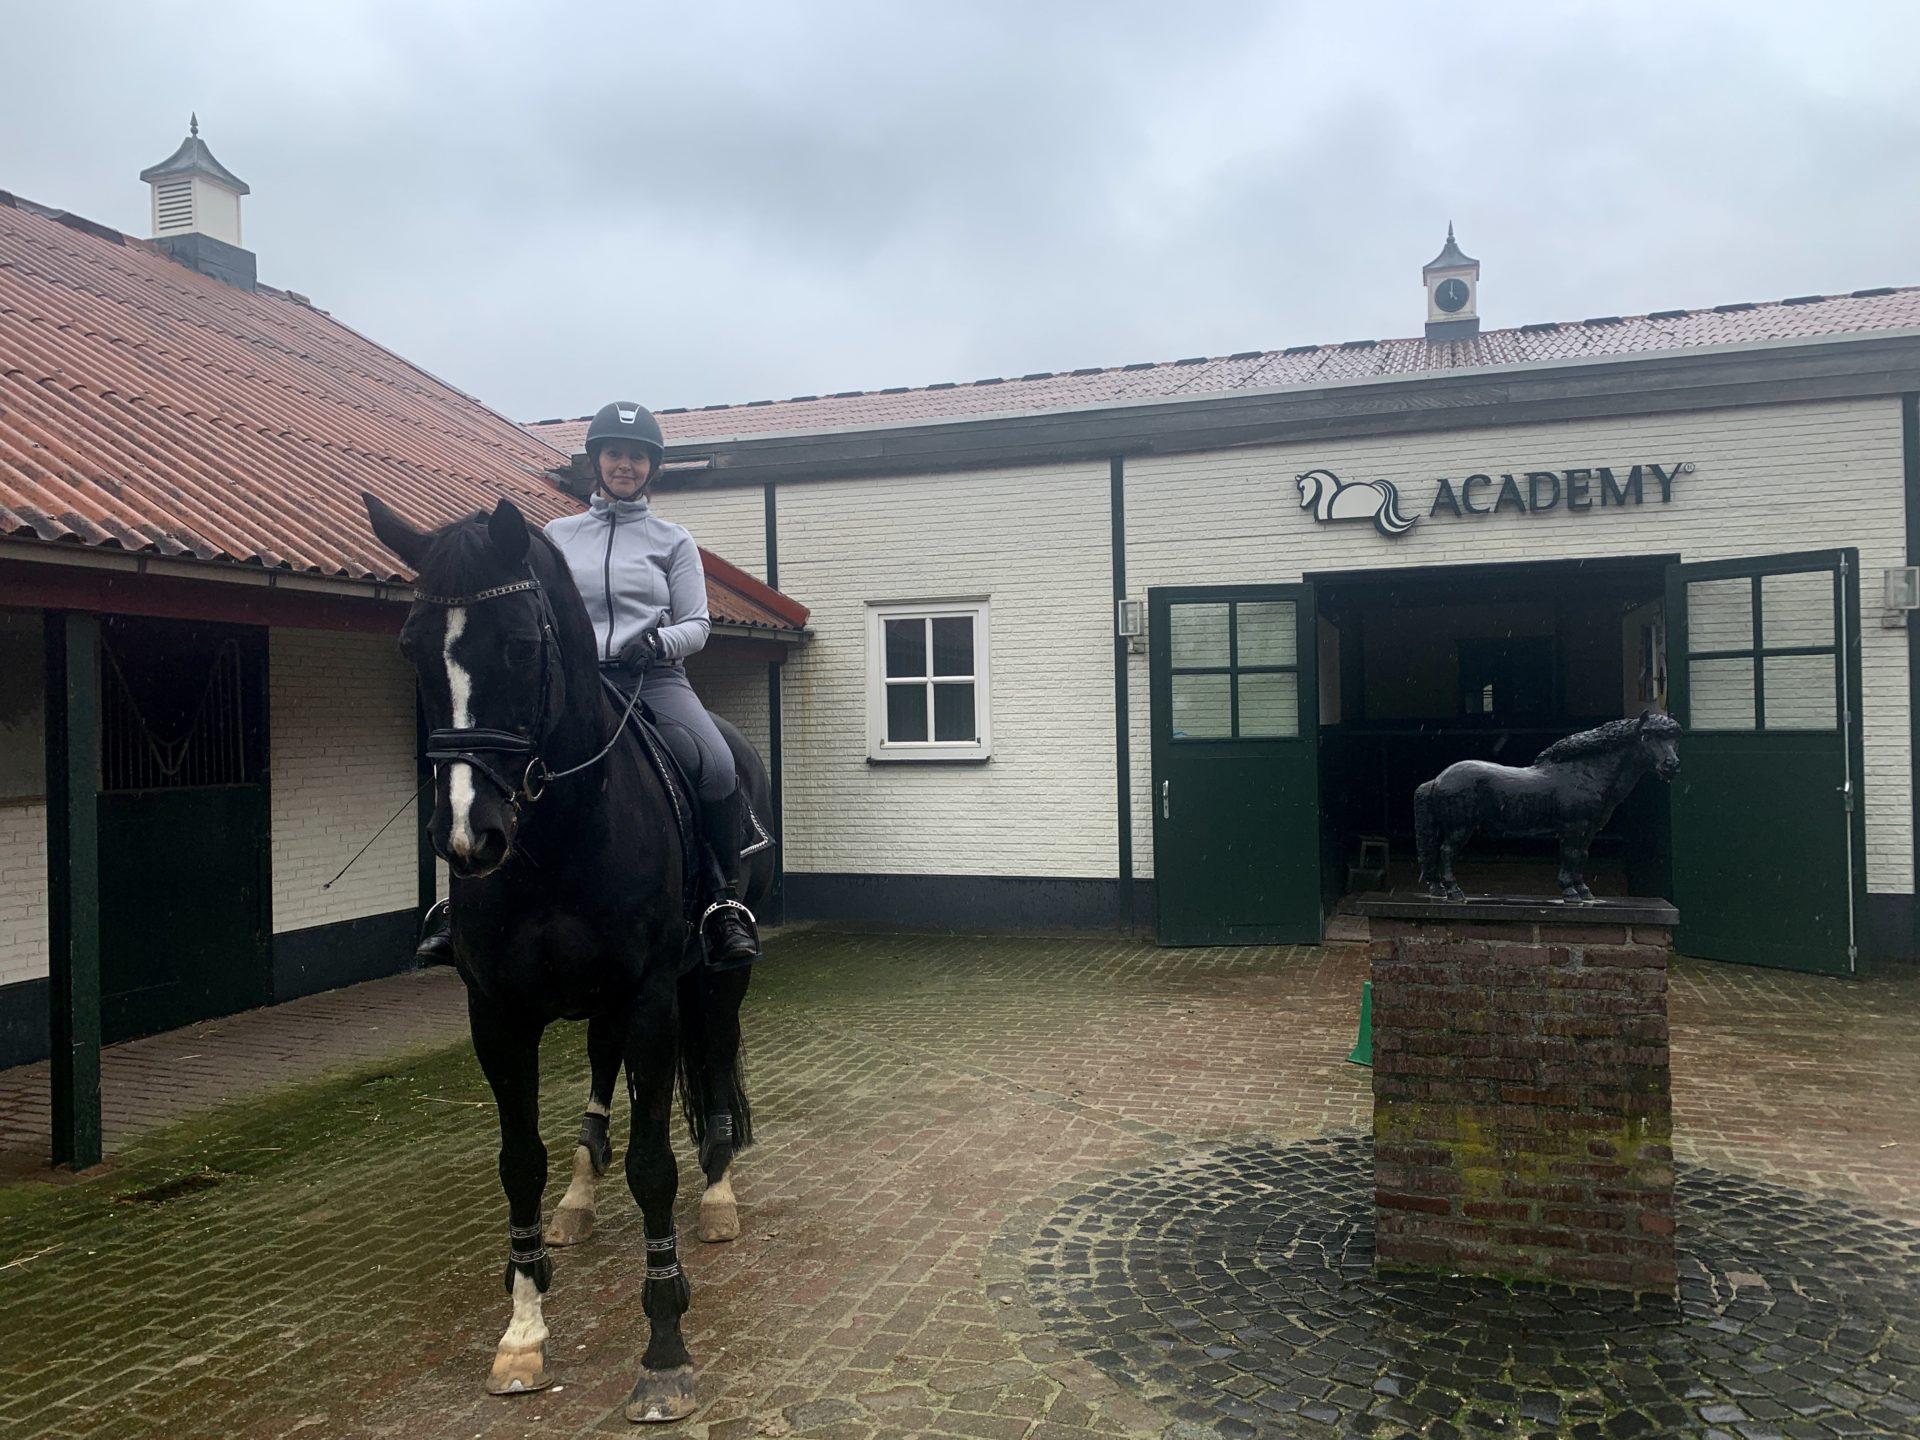 Annabel Steller-Trainingsweek Academy Bartels